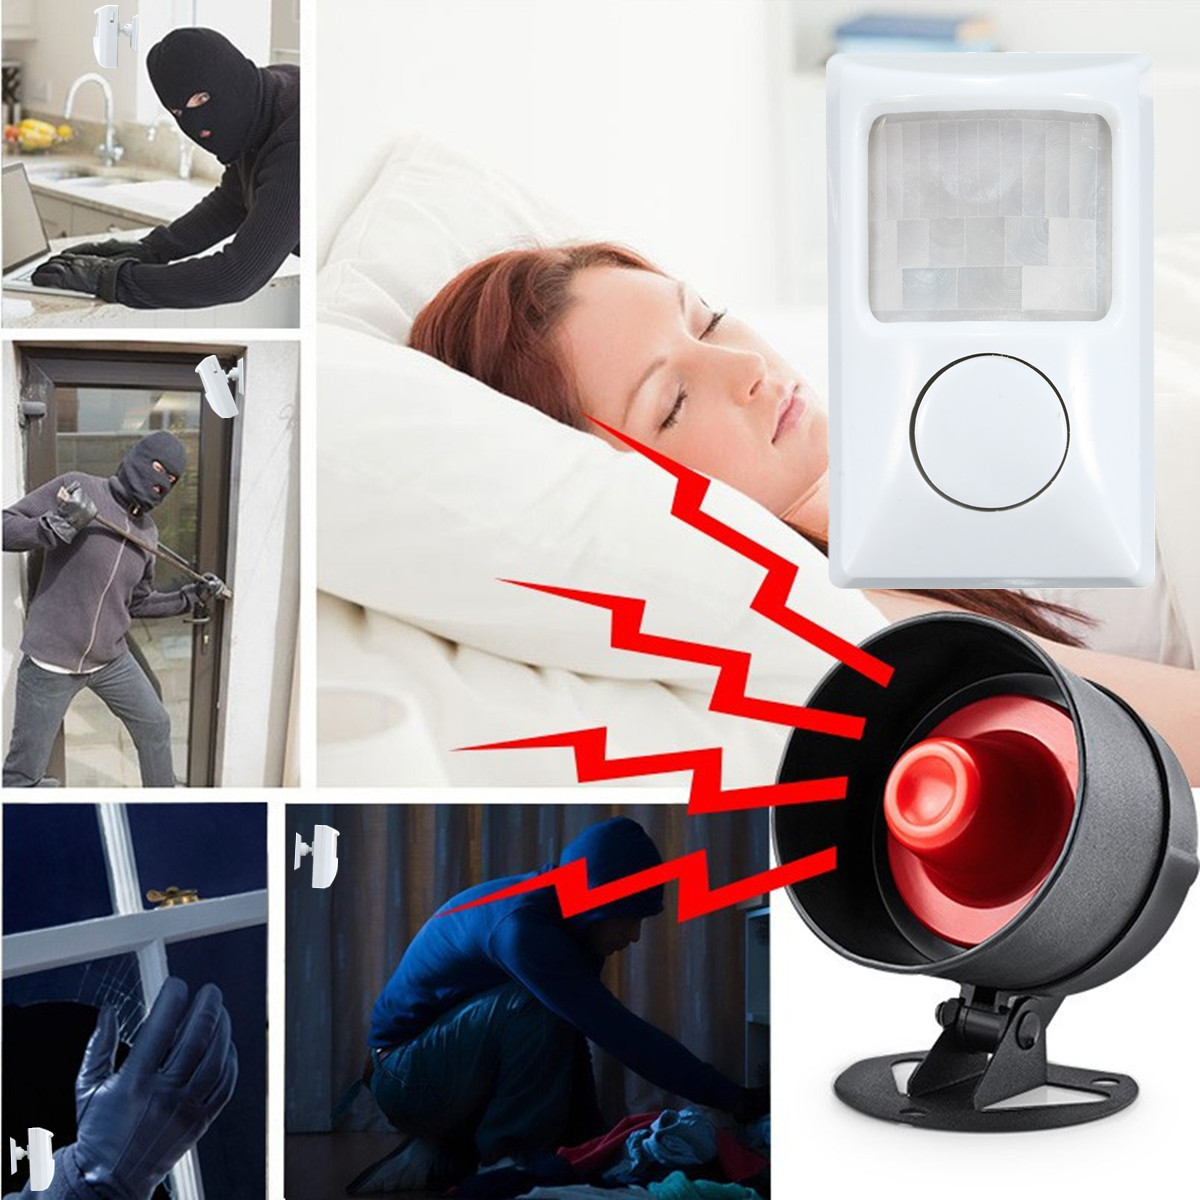 90dB Security Burglar Alarm System Infrared Motion Sensor Detector PIR Alarm Home Shed Garage For Home Security